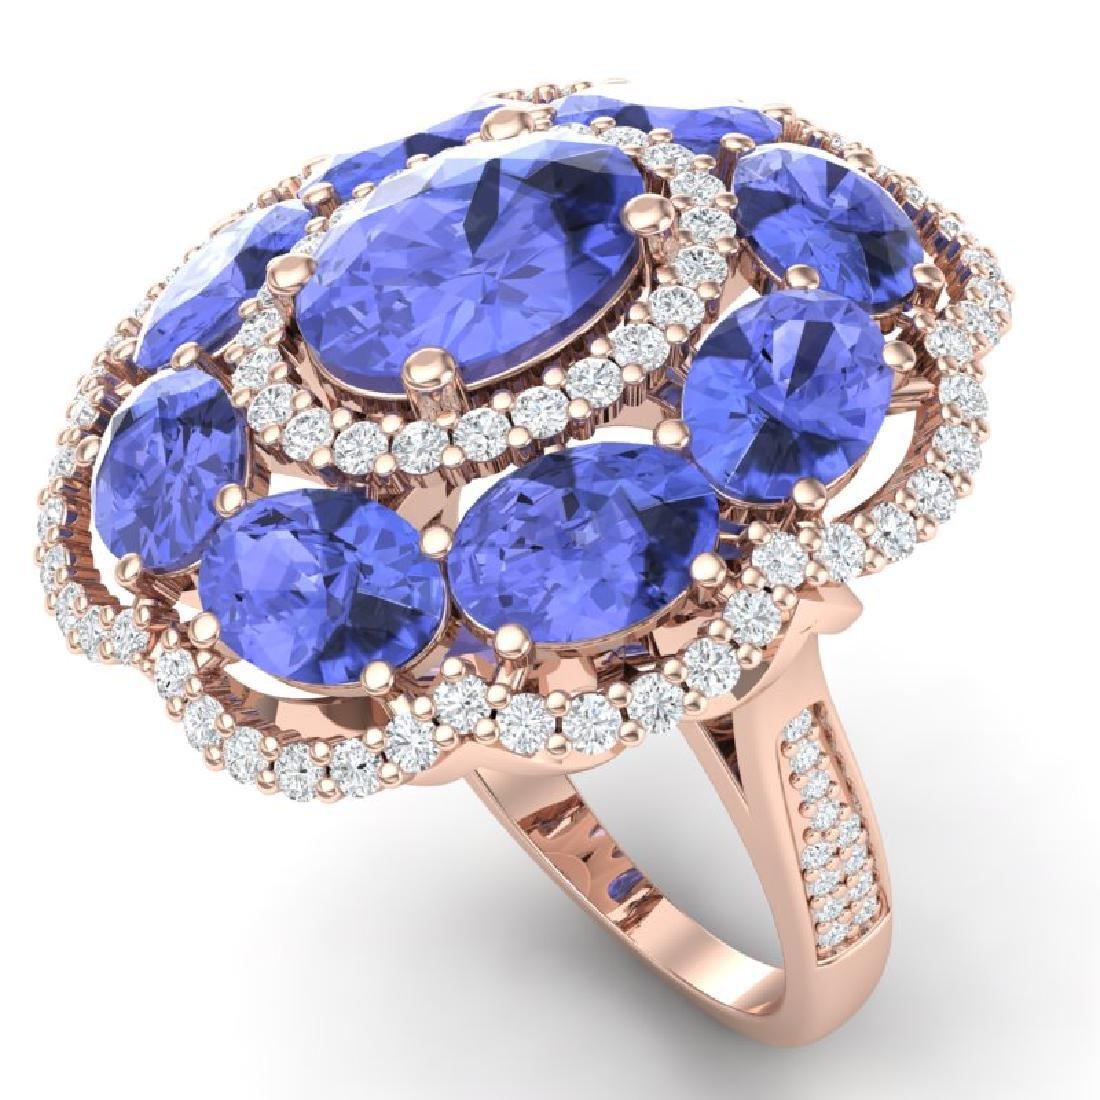 15.24 CTW Royalty Tanzanite & VS Diamond Ring 18K Rose